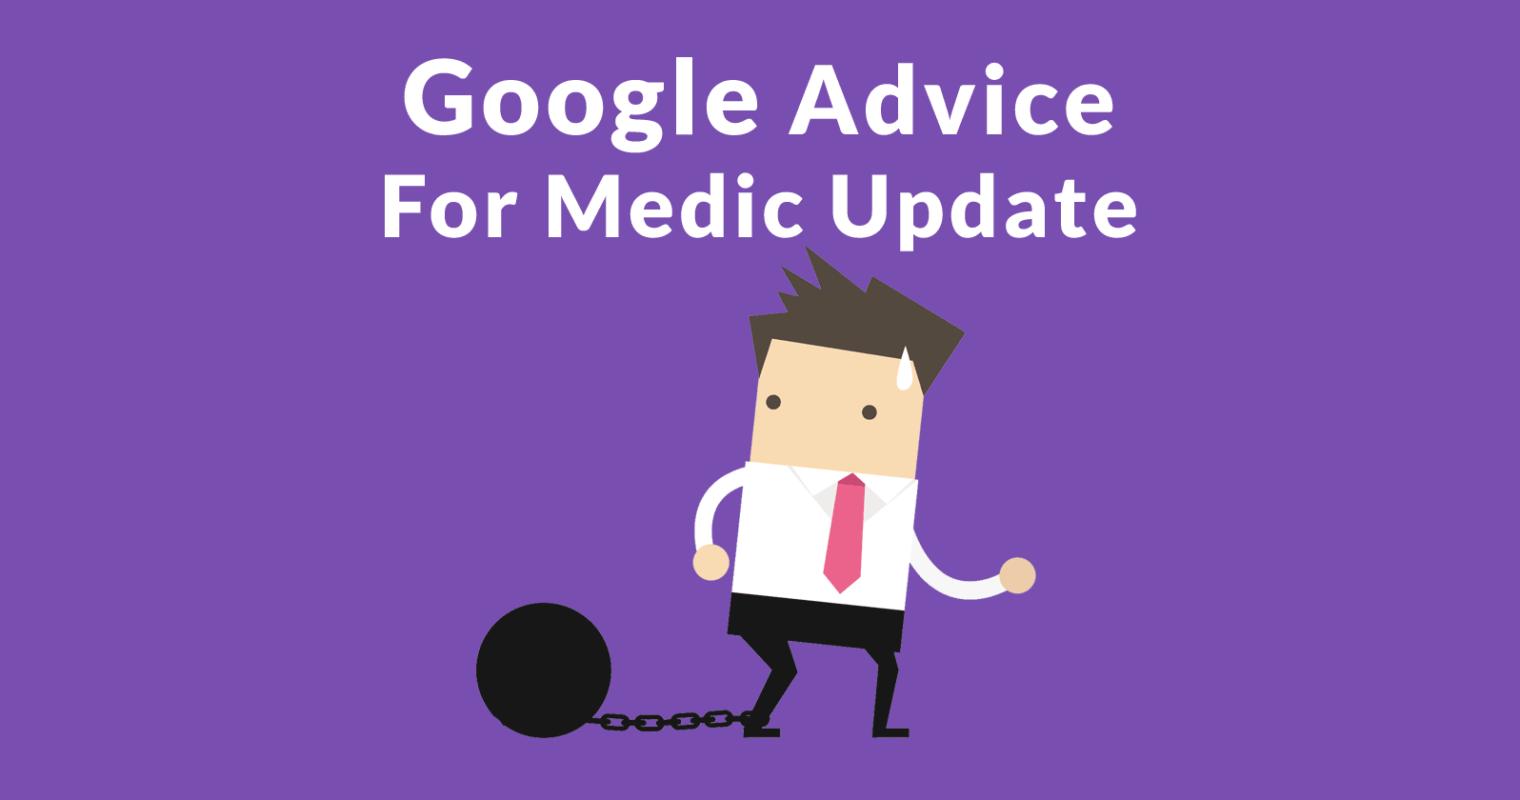 https://res.cloudinary.com/dpyy9uysx/image/upload/v1550550879/seo/google-medic-update-recover-seowarriors.png